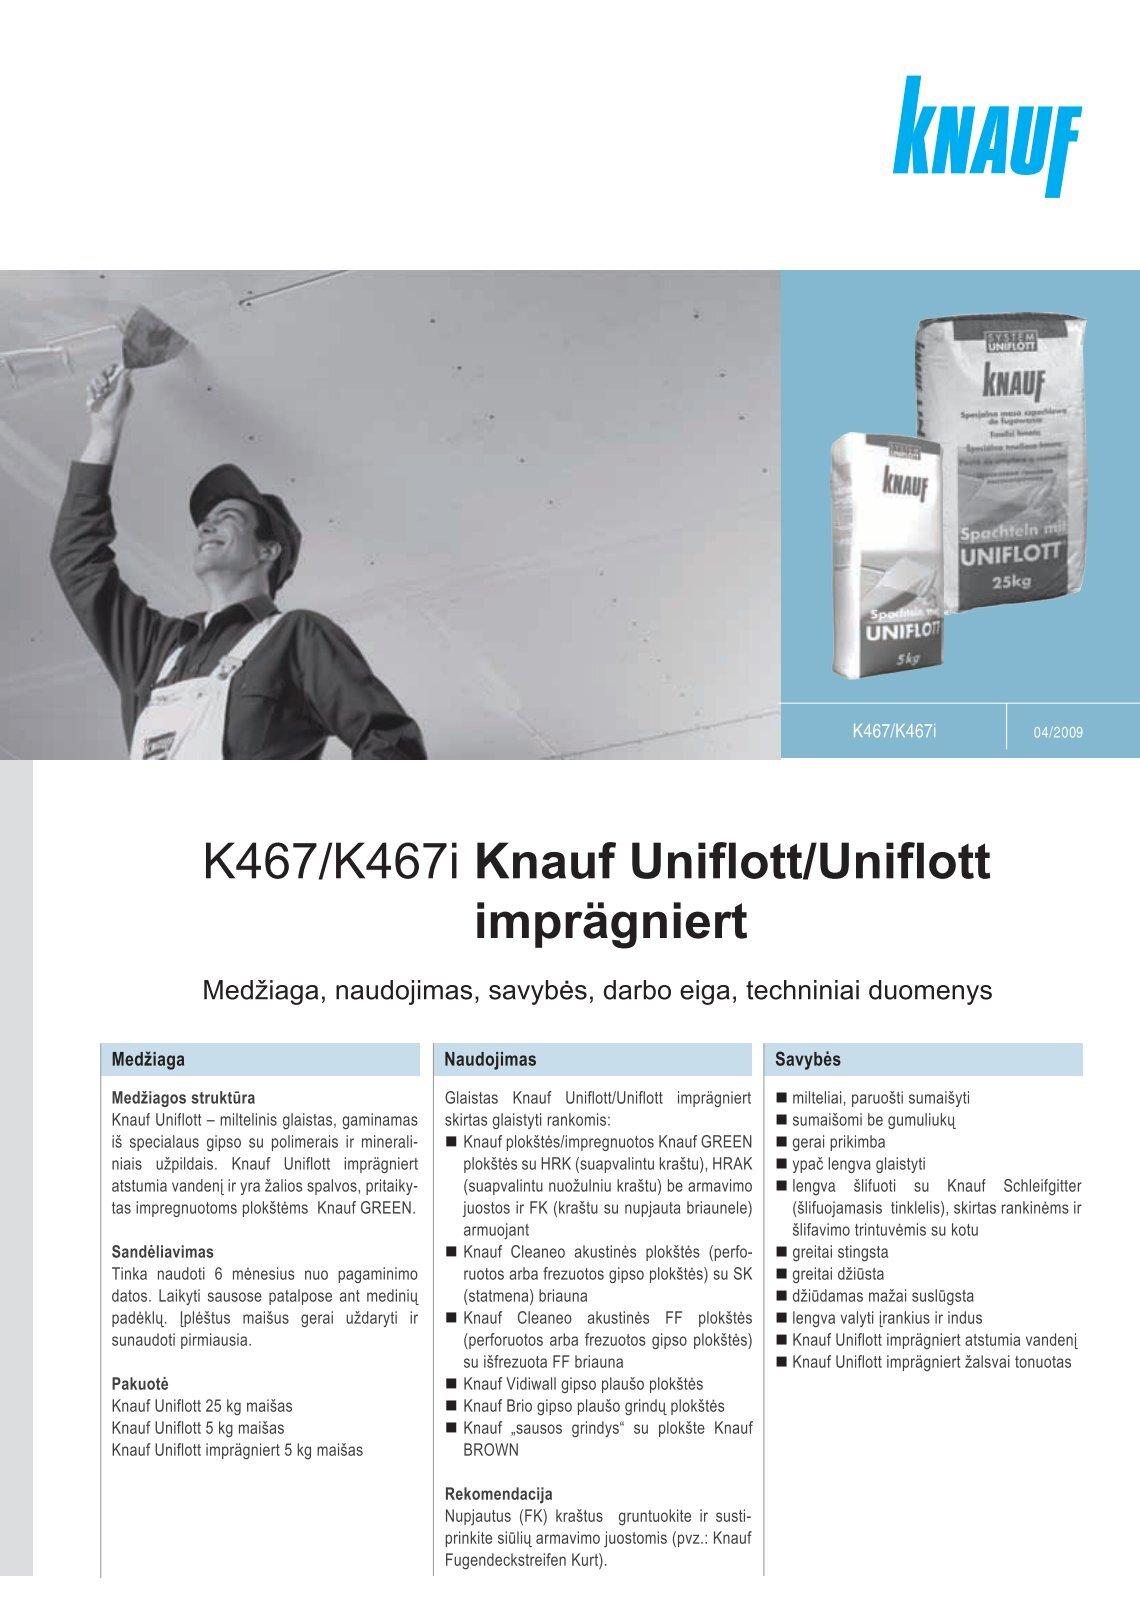 190 free magazines from knauf.lt